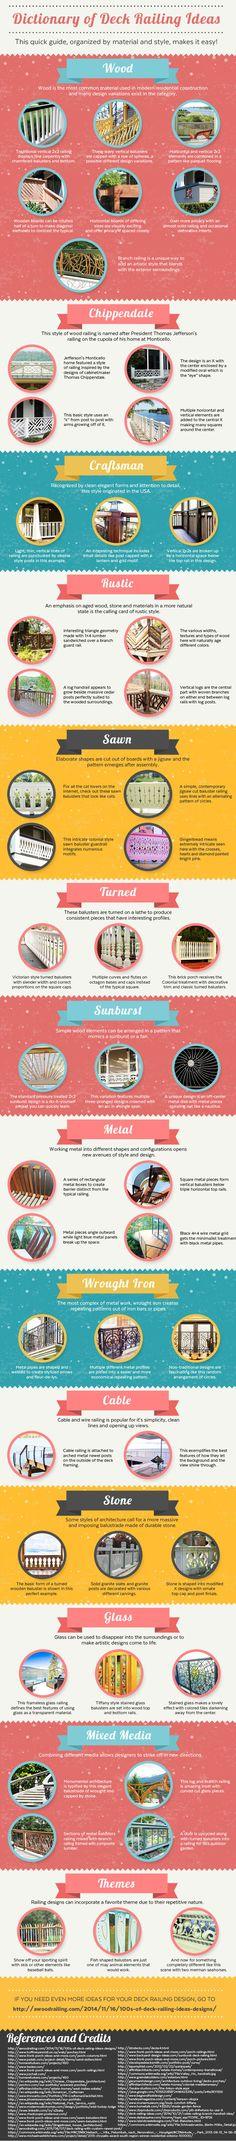 Guide to Deck Railin